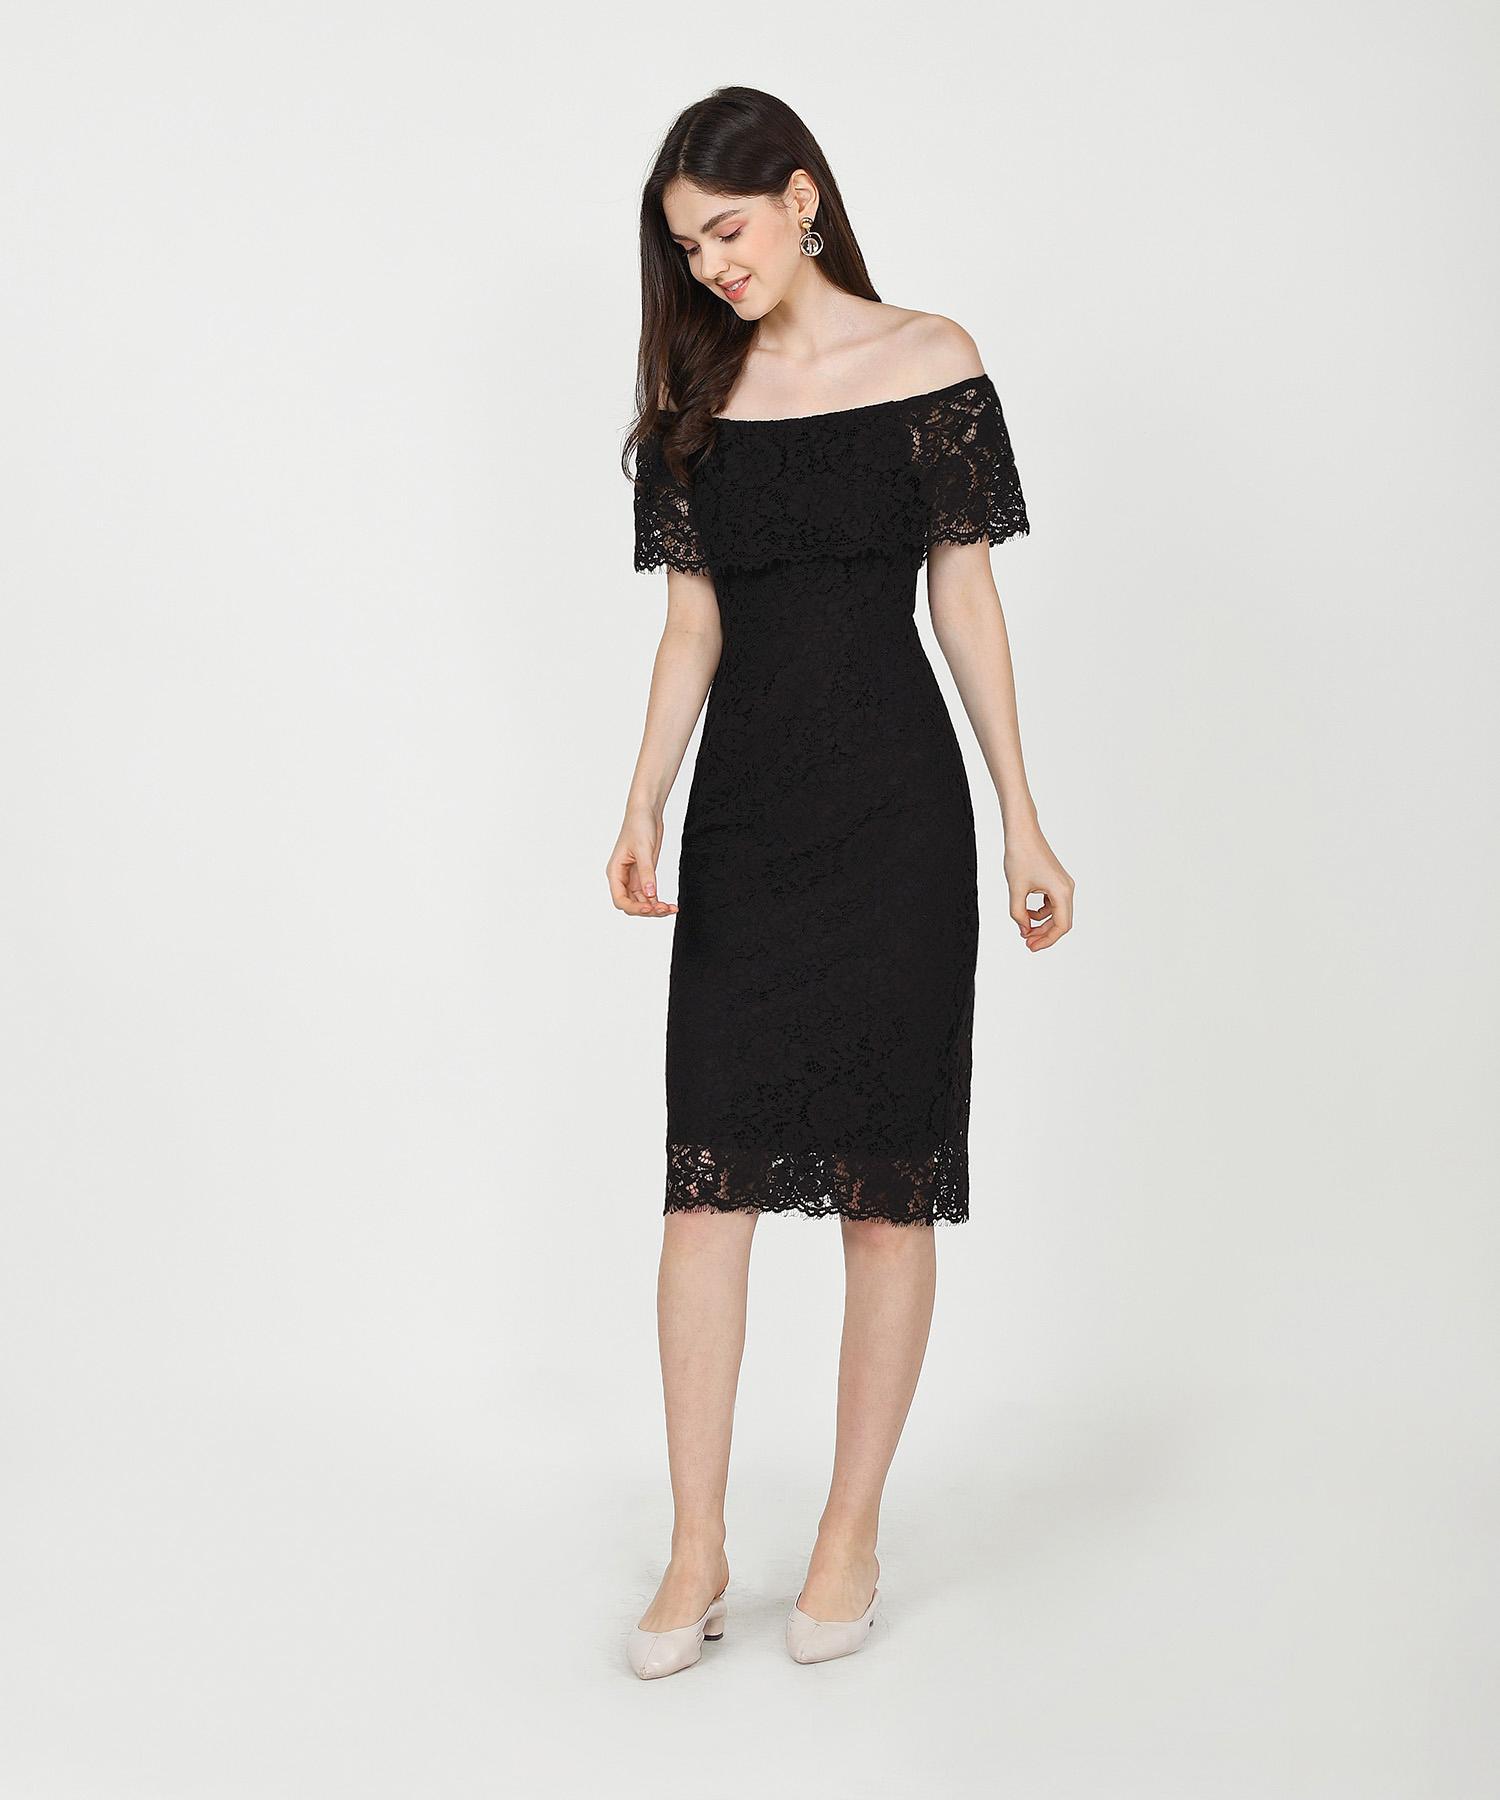 marie-lace-off-shoulder-midi-dress-black-1